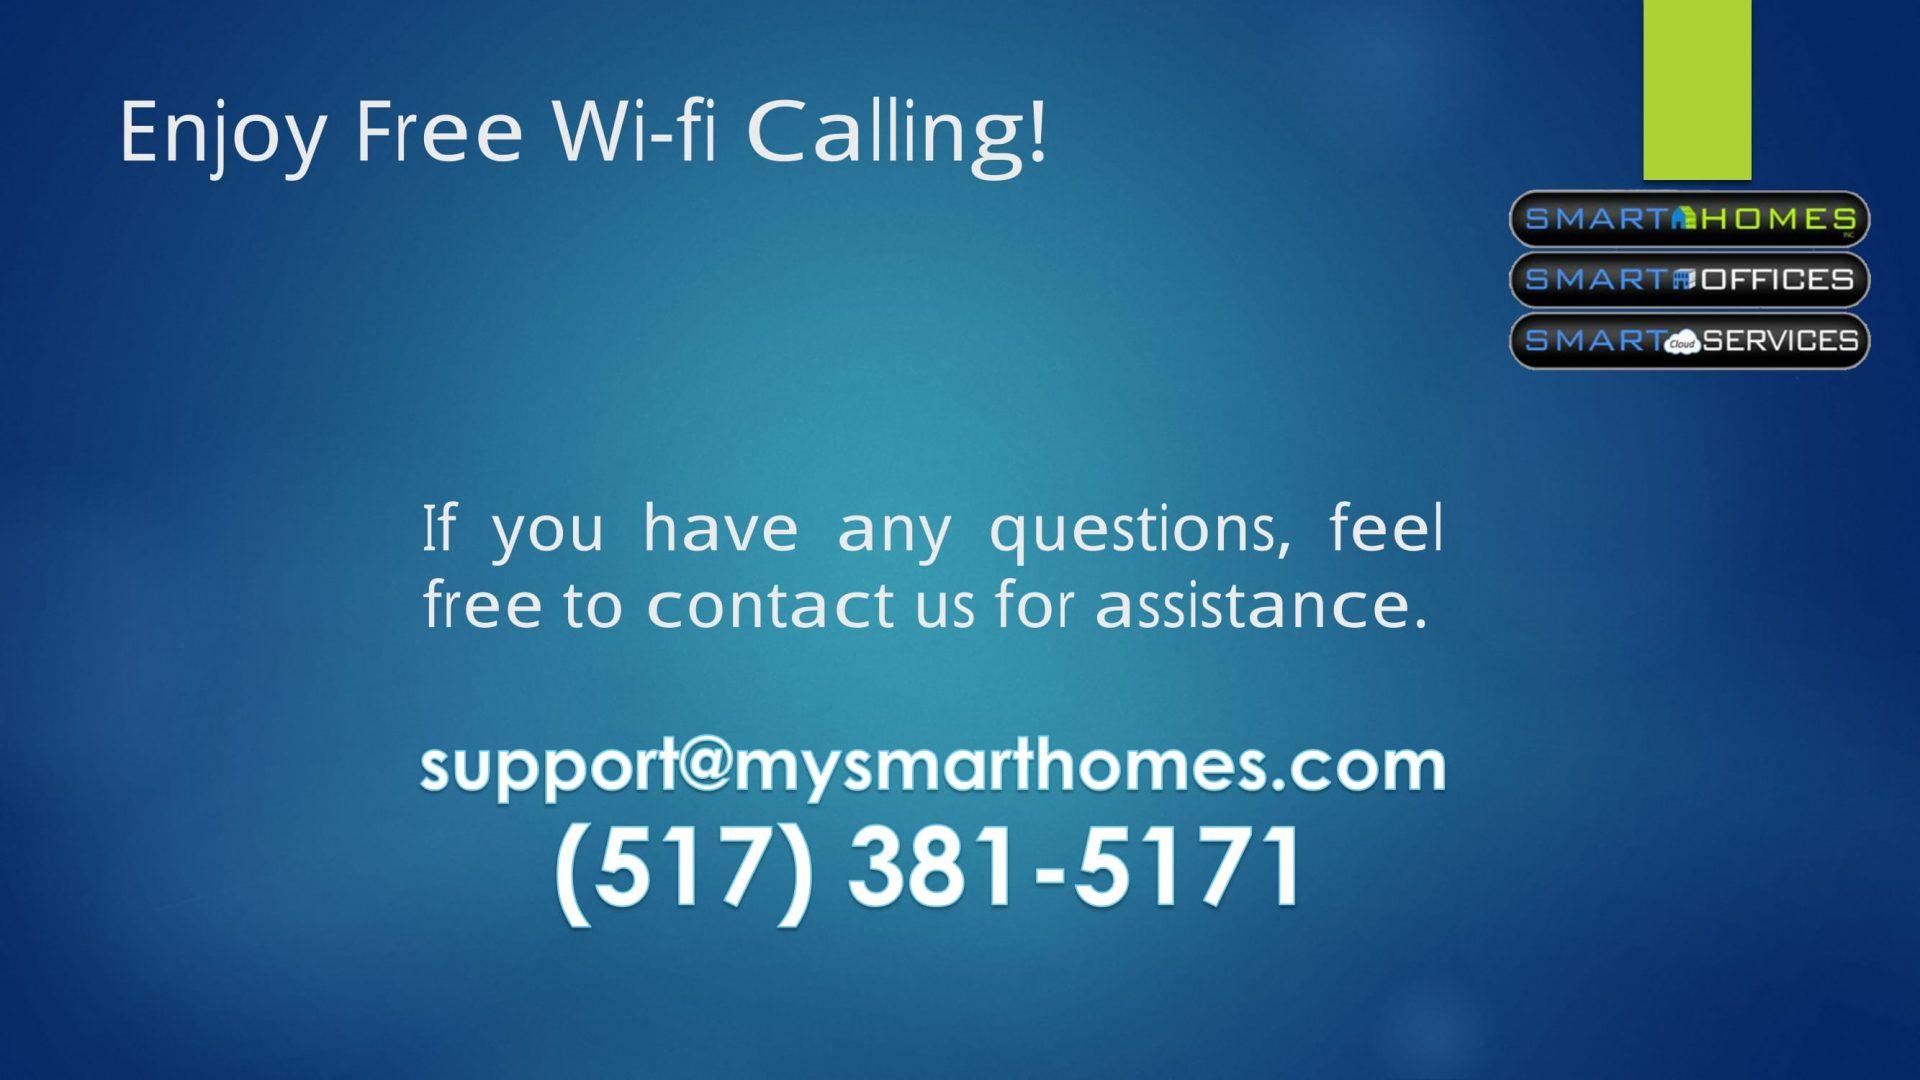 Smart Homes Inc Google Voice Guide-17